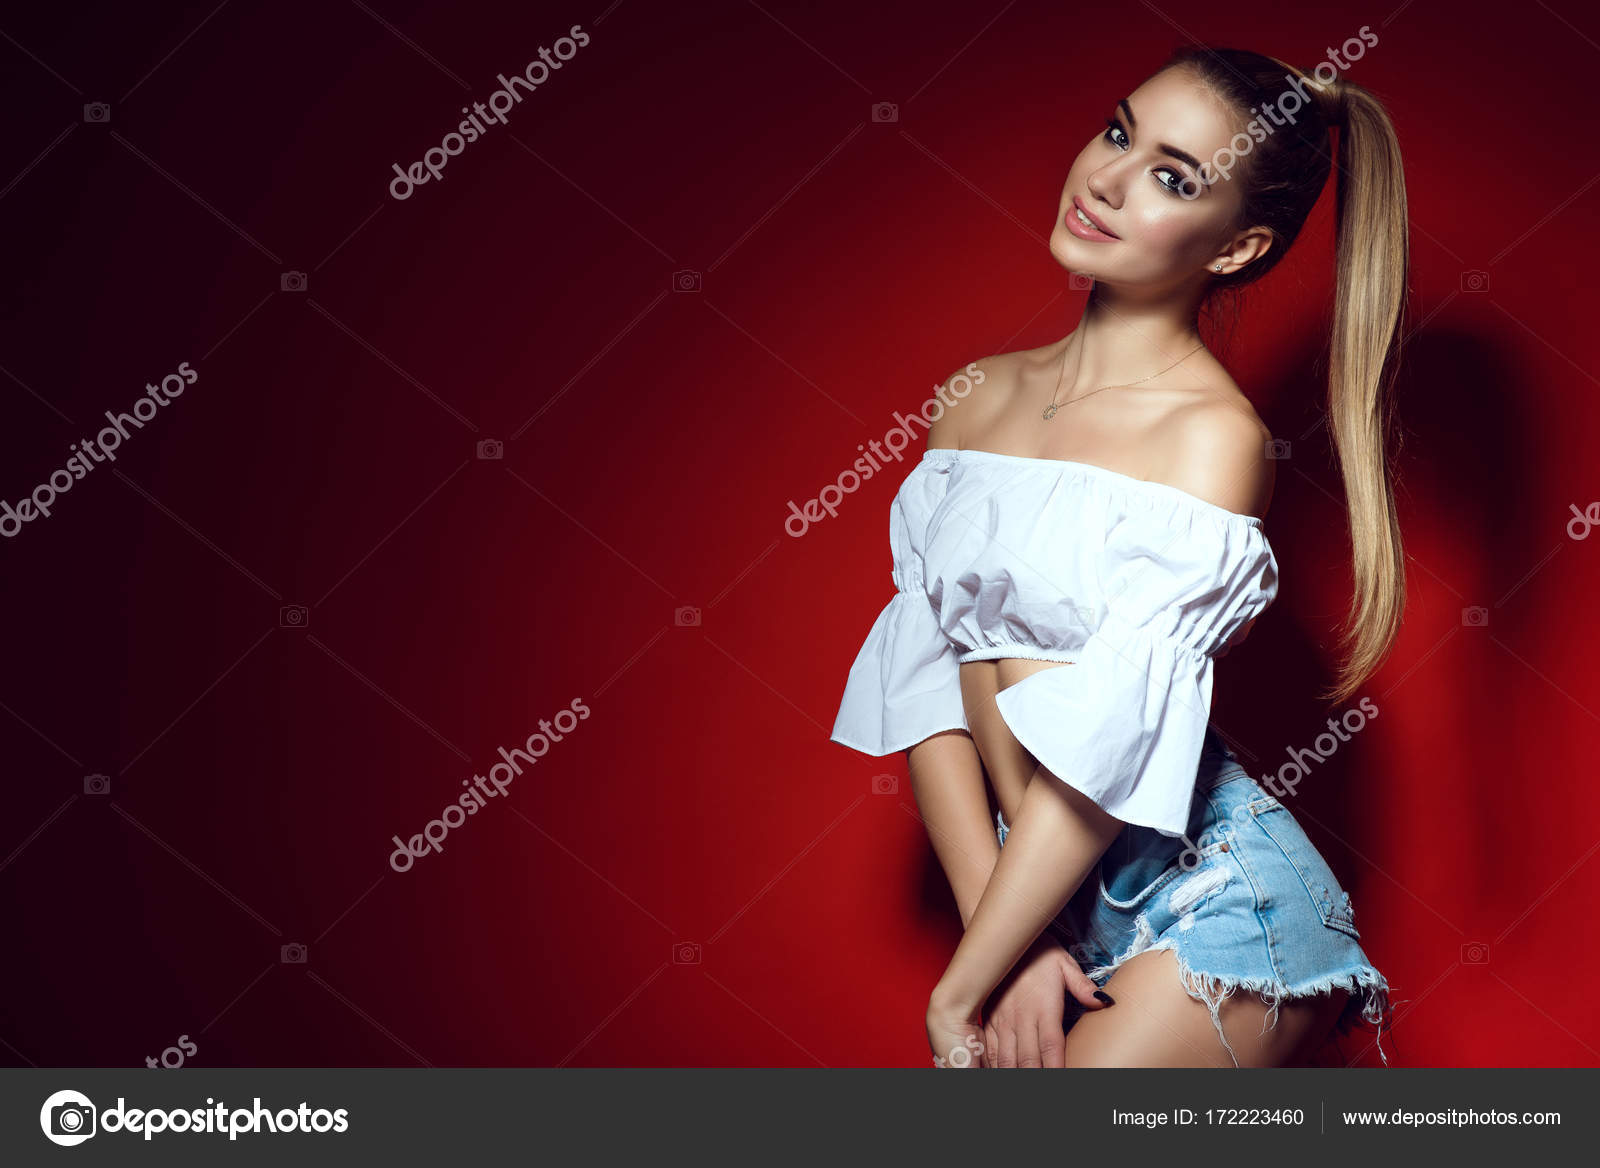 polnaya-blondinka-sverhu-liza-ann-porno-milf-onlayn